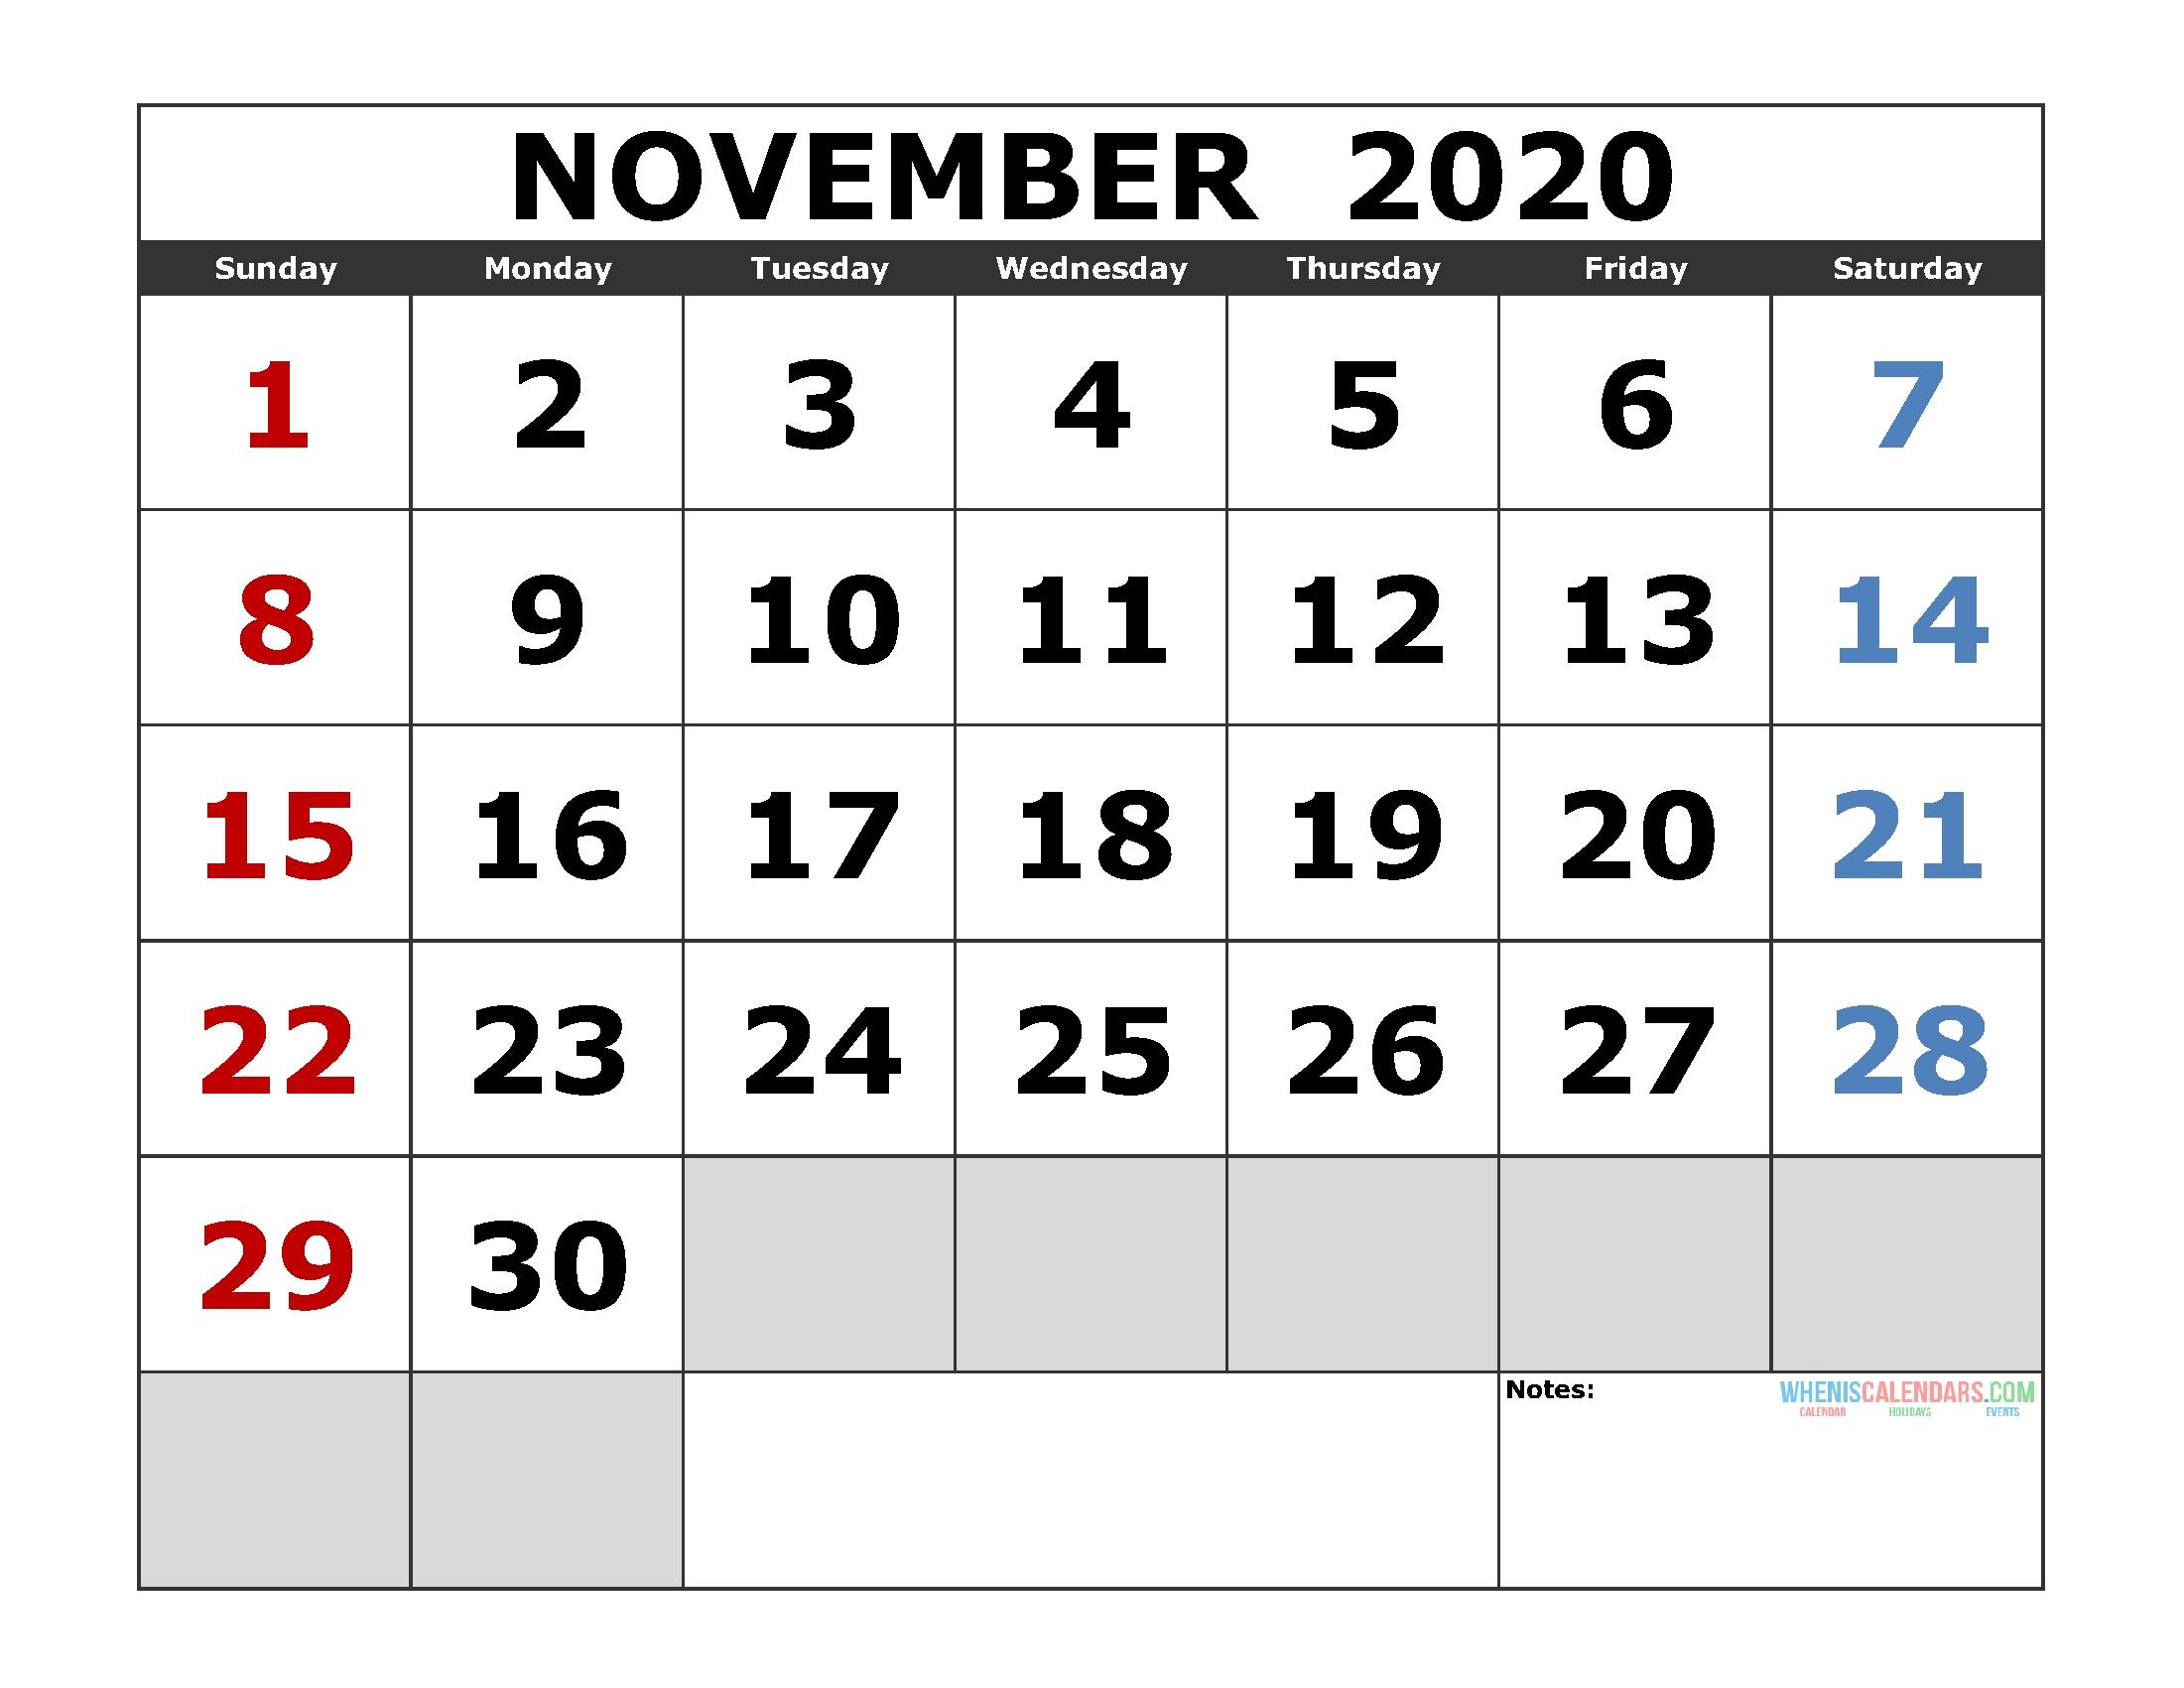 November 2020 Printable Calendar Template Excel, Pdf, Image-2020 Jewish Holidays Printable Calendar